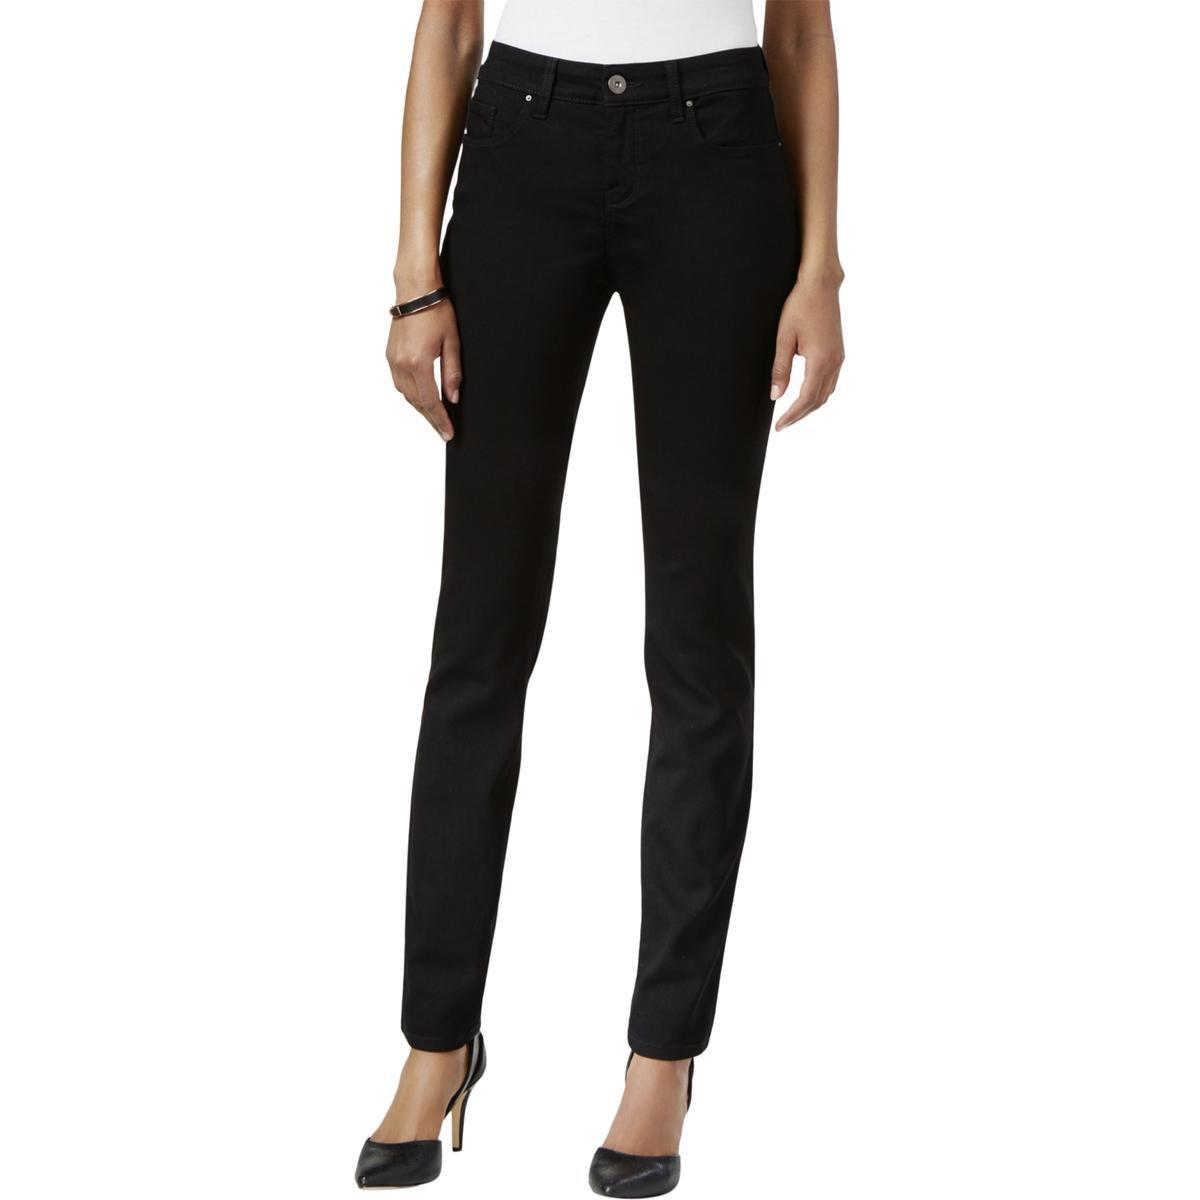 Style & Co. Womens Plus Black Wash Comfort Waist Skinny Jeans Black 14